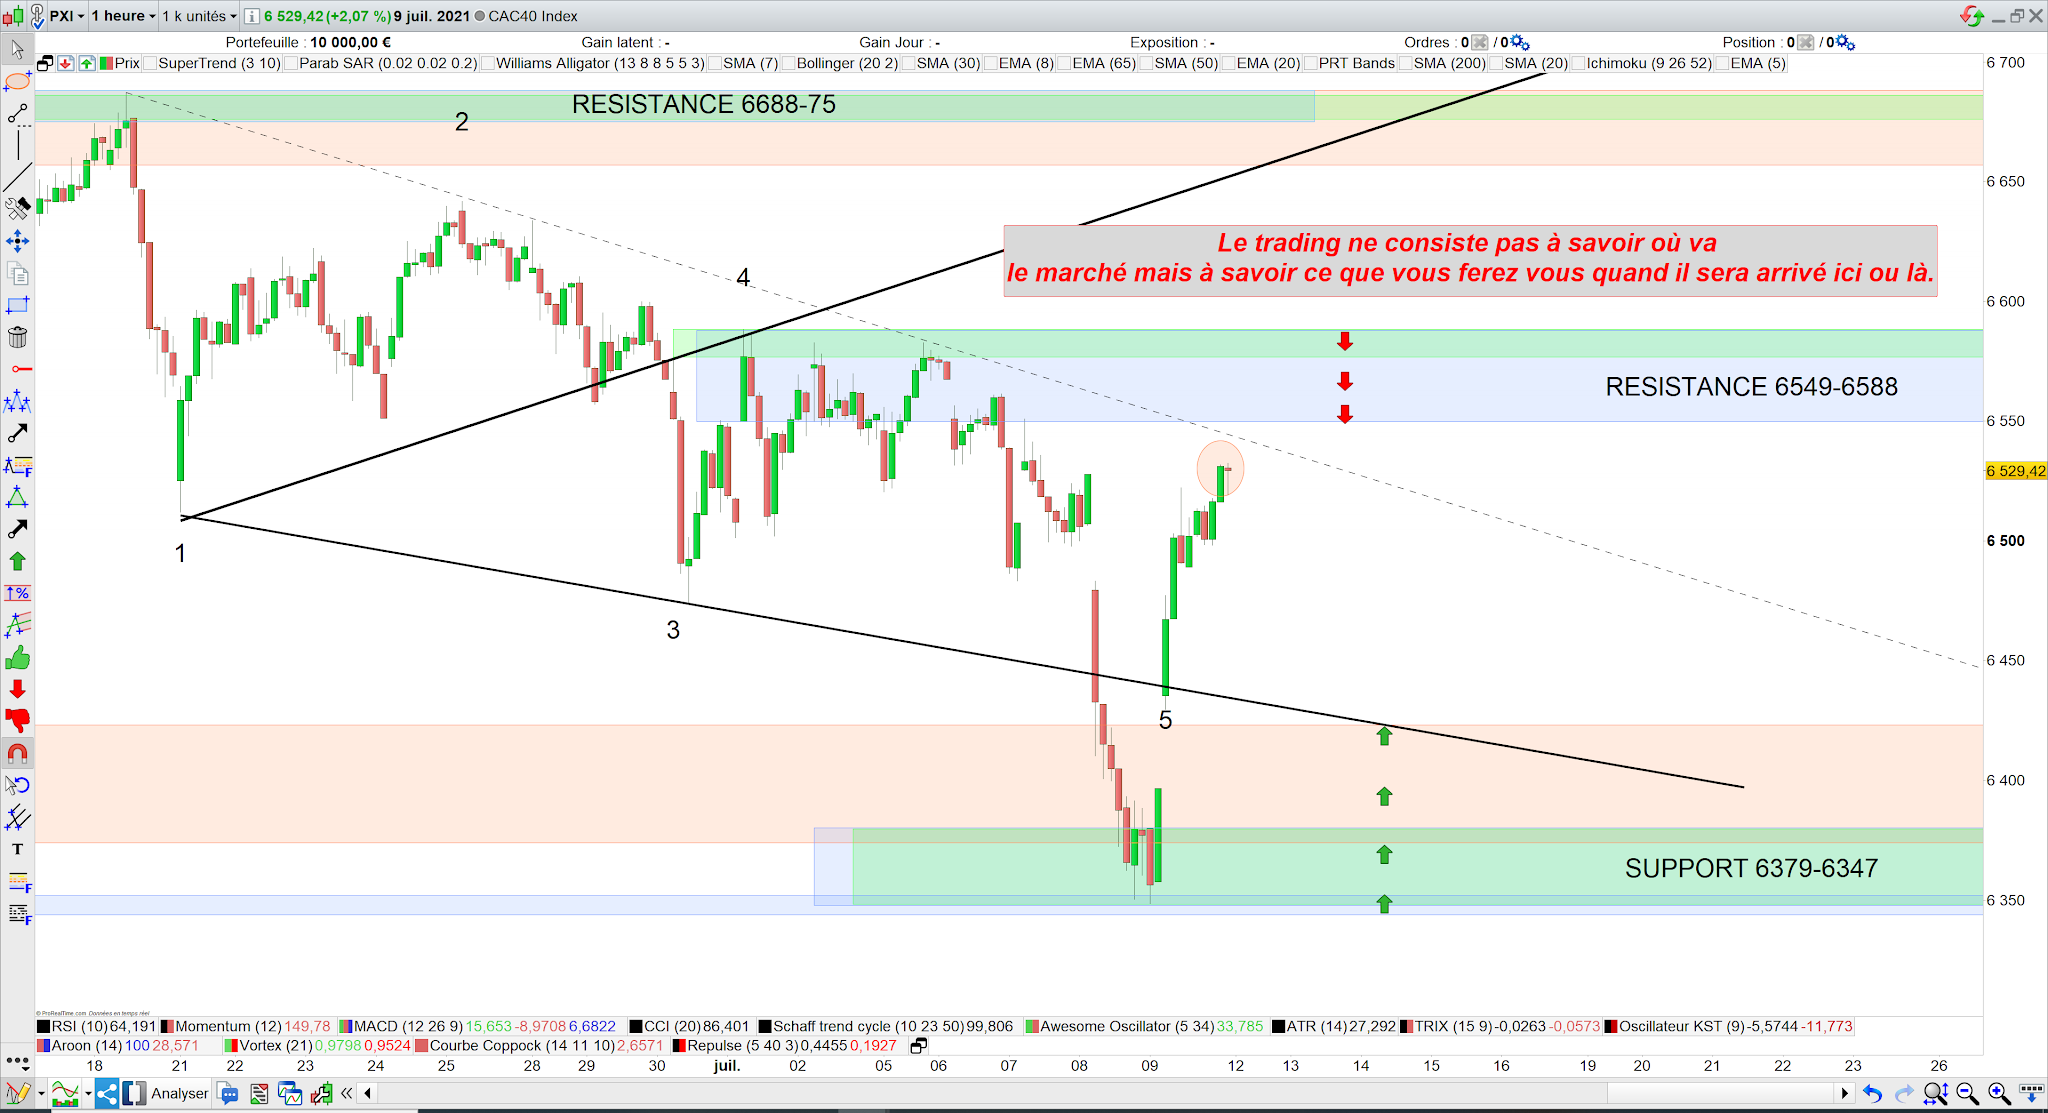 Matrice trading cac40 12/07/21